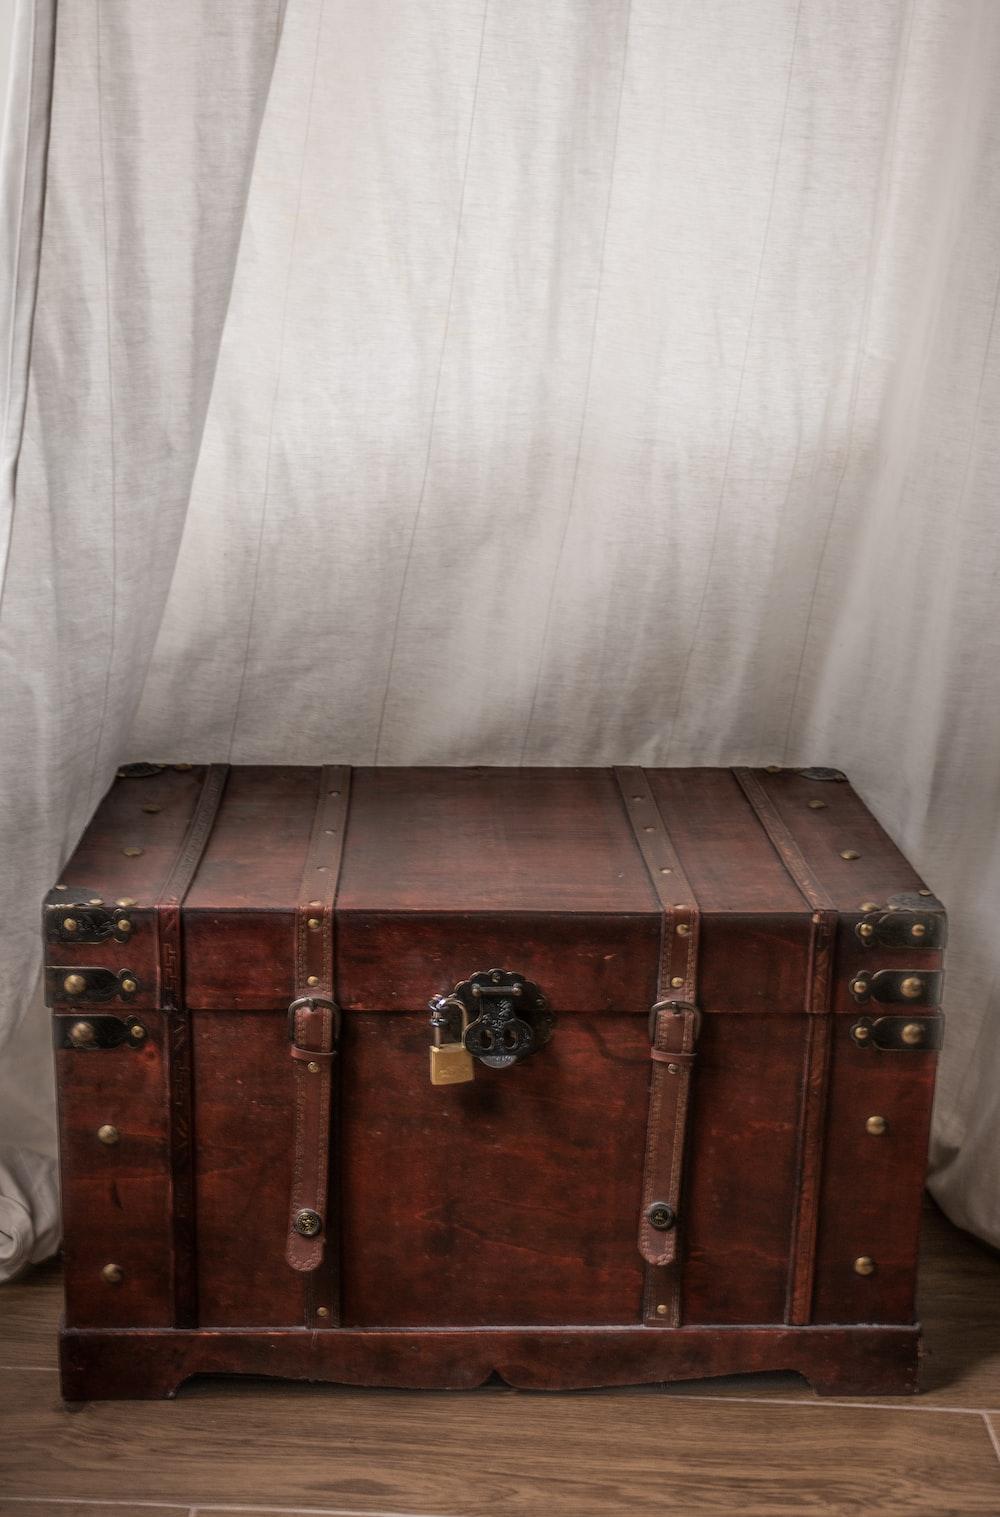 brown wooden trunk